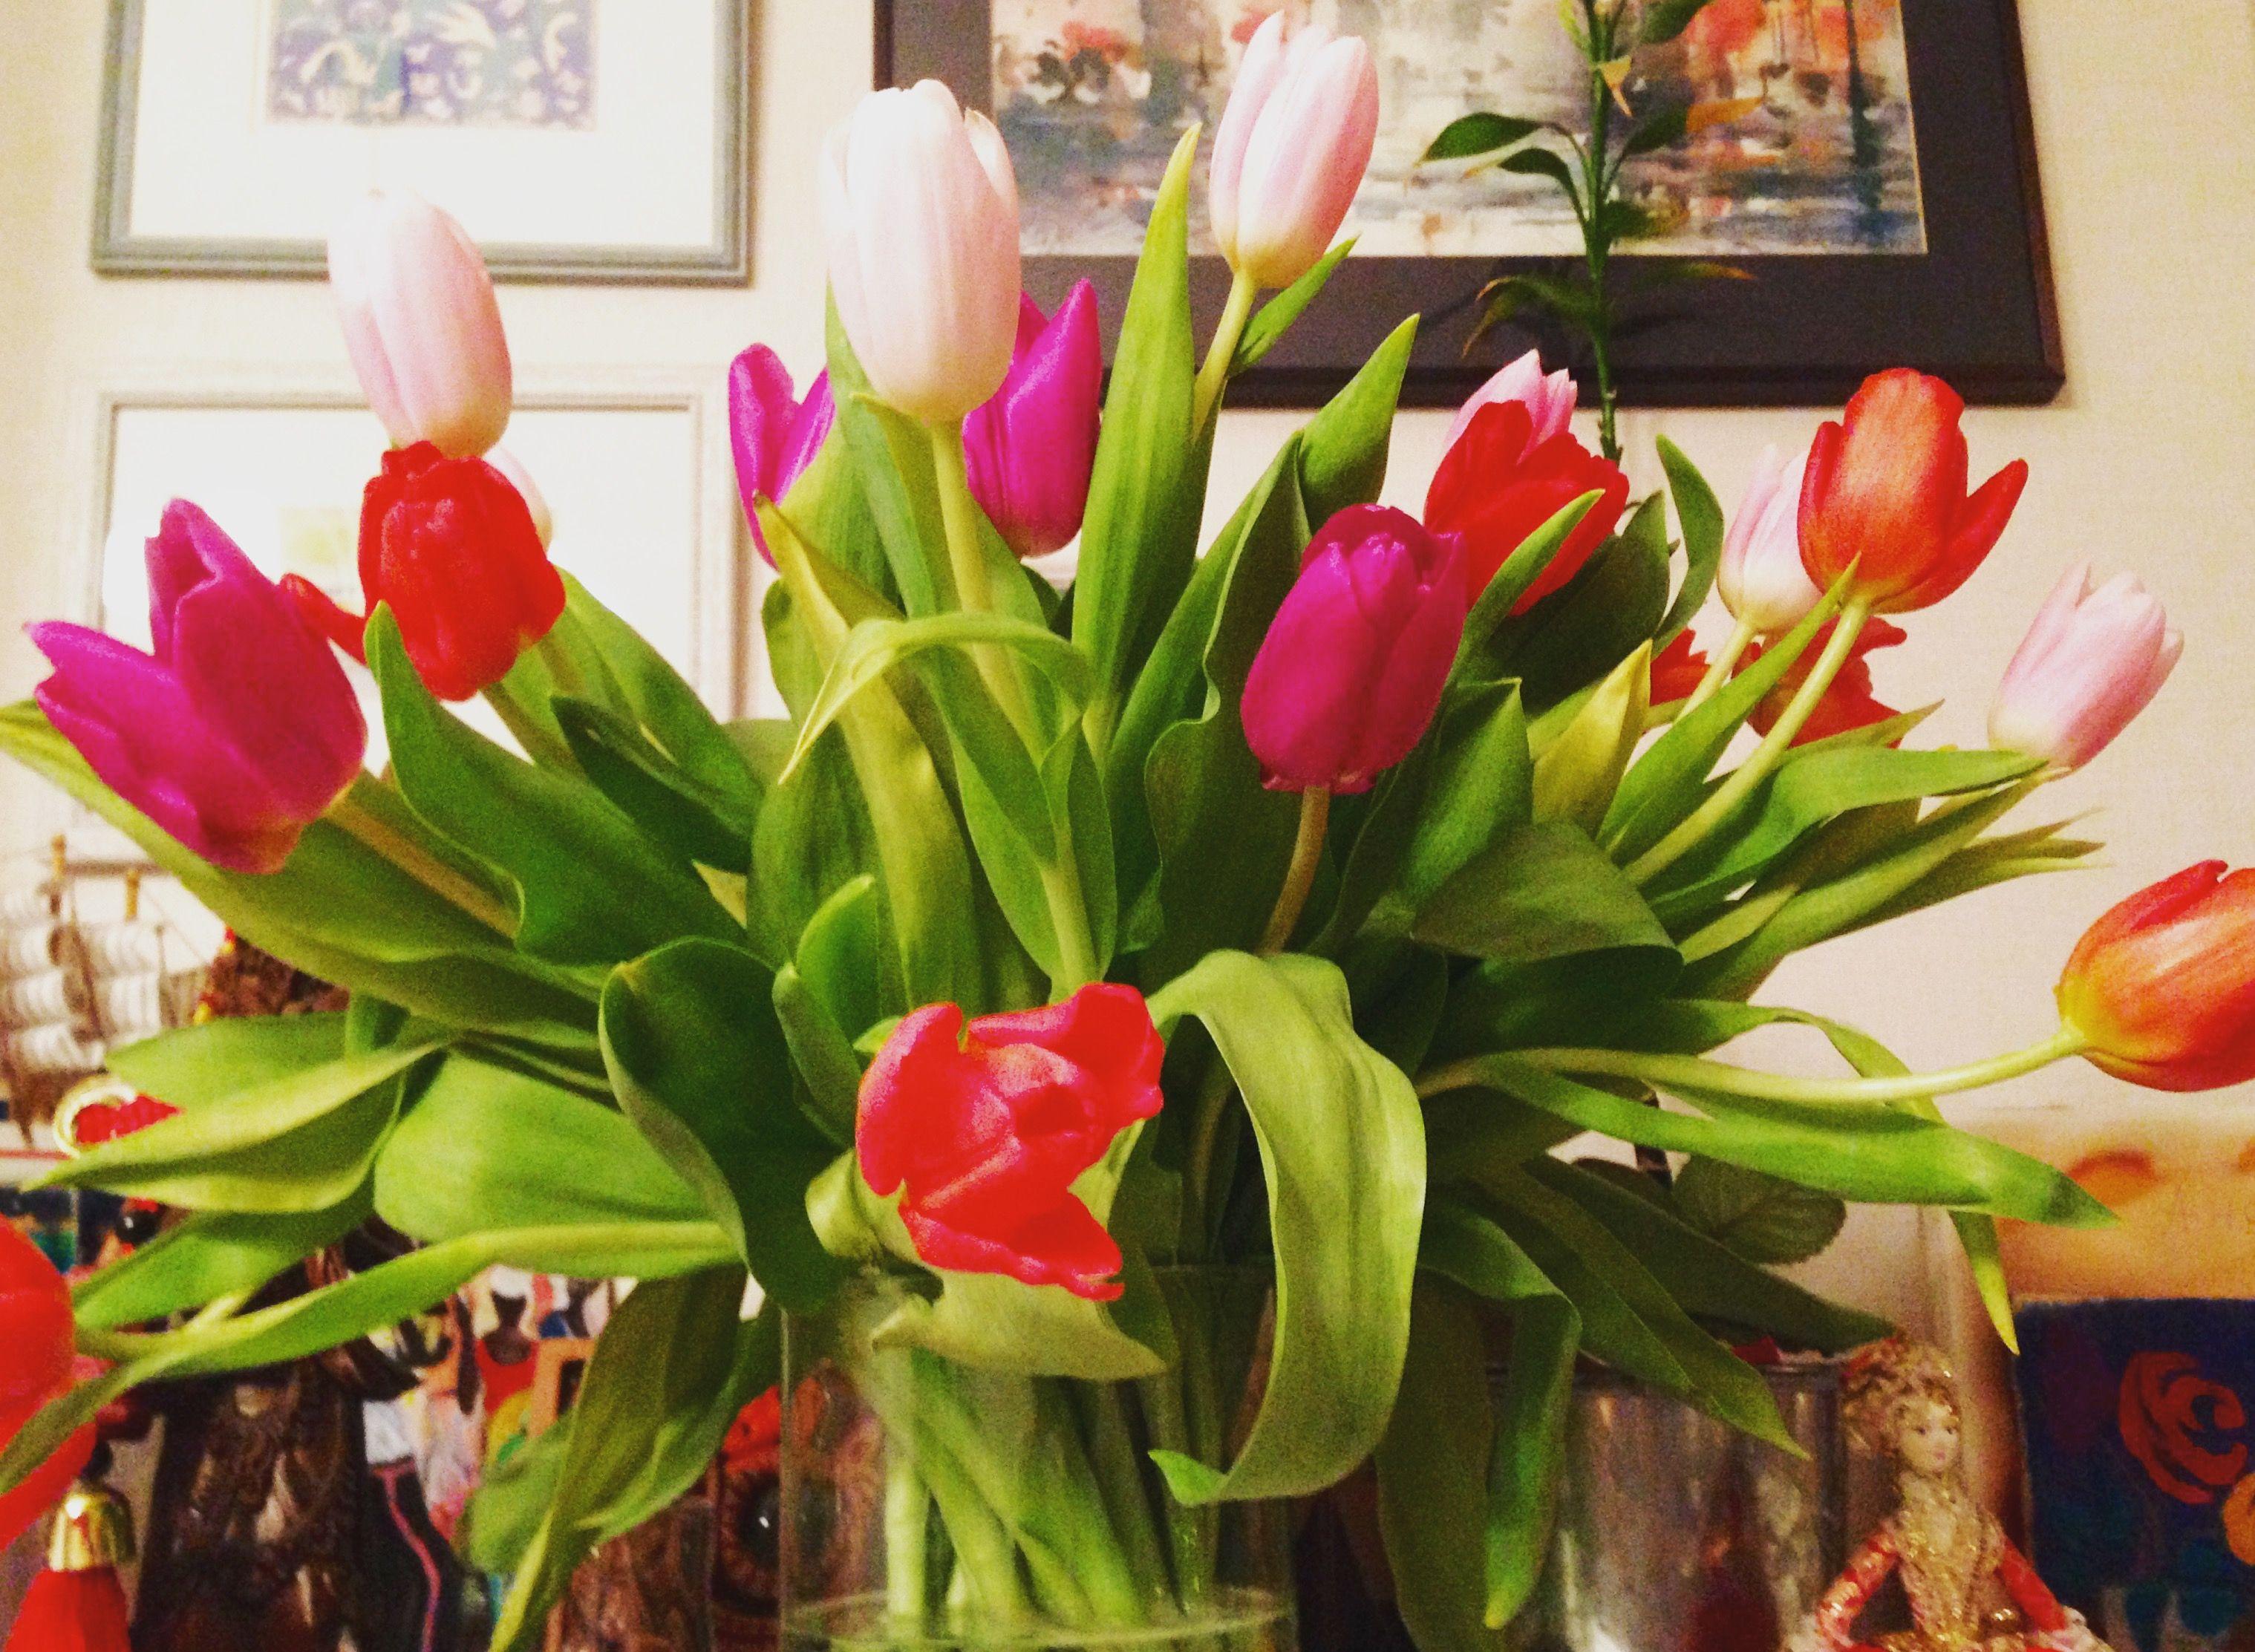 Happy women's day! #flowers #tulips #womensday